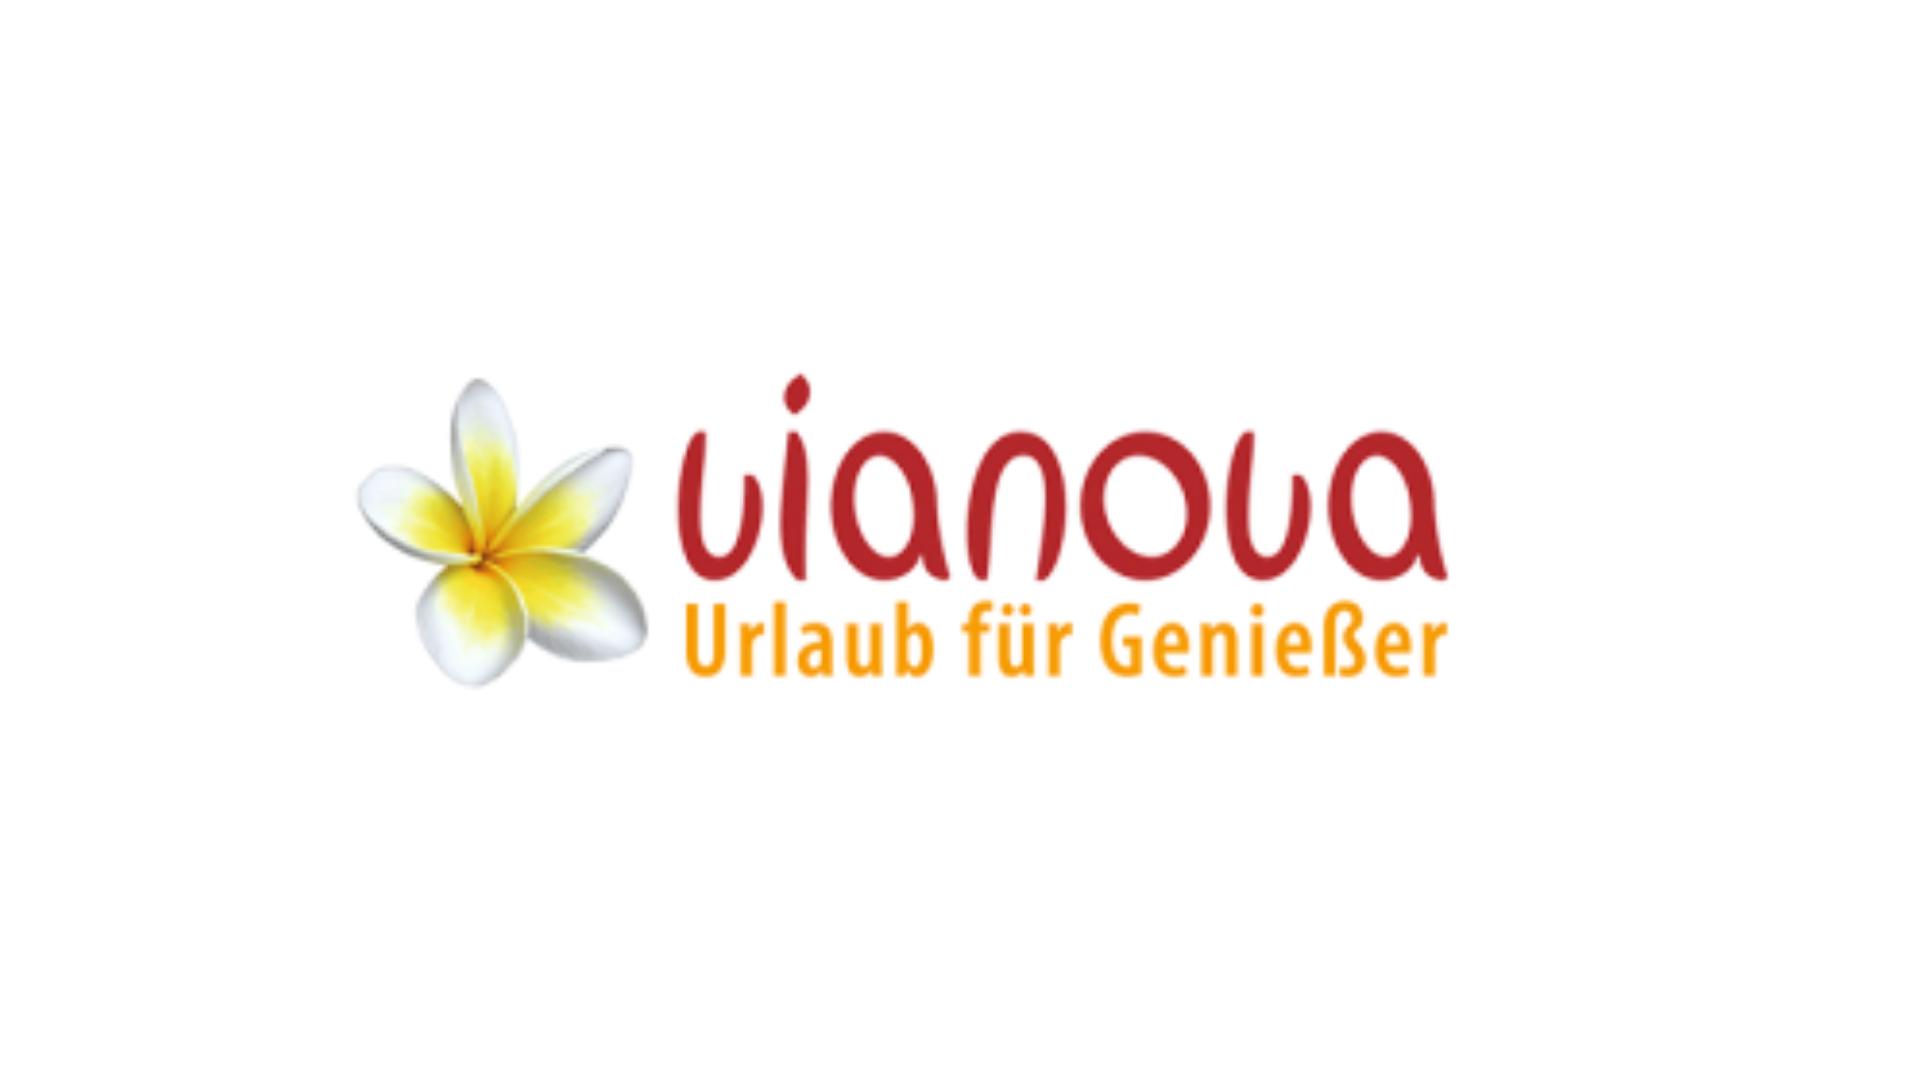 vianova-logo-w2